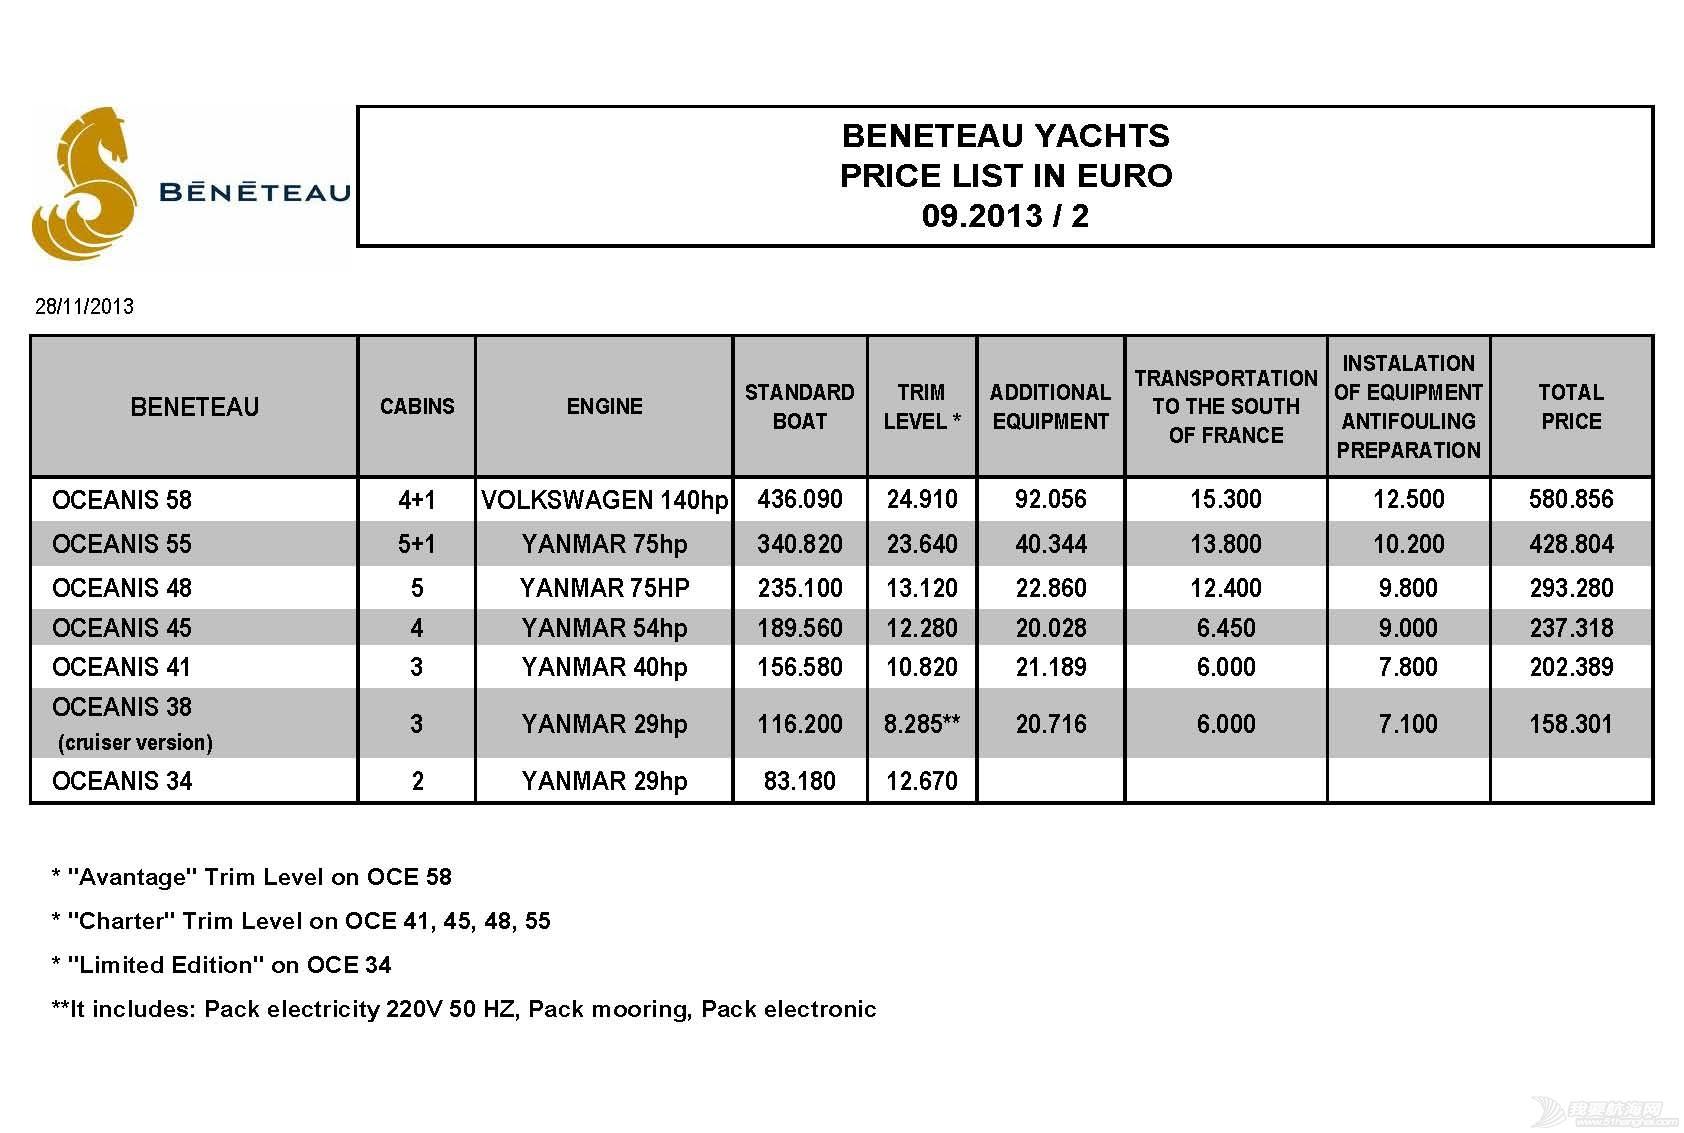 帆船 主流帆船价目设备表——beneteau Oceanis全系列 BeneteauOceanis34_management_页面_1.jpg